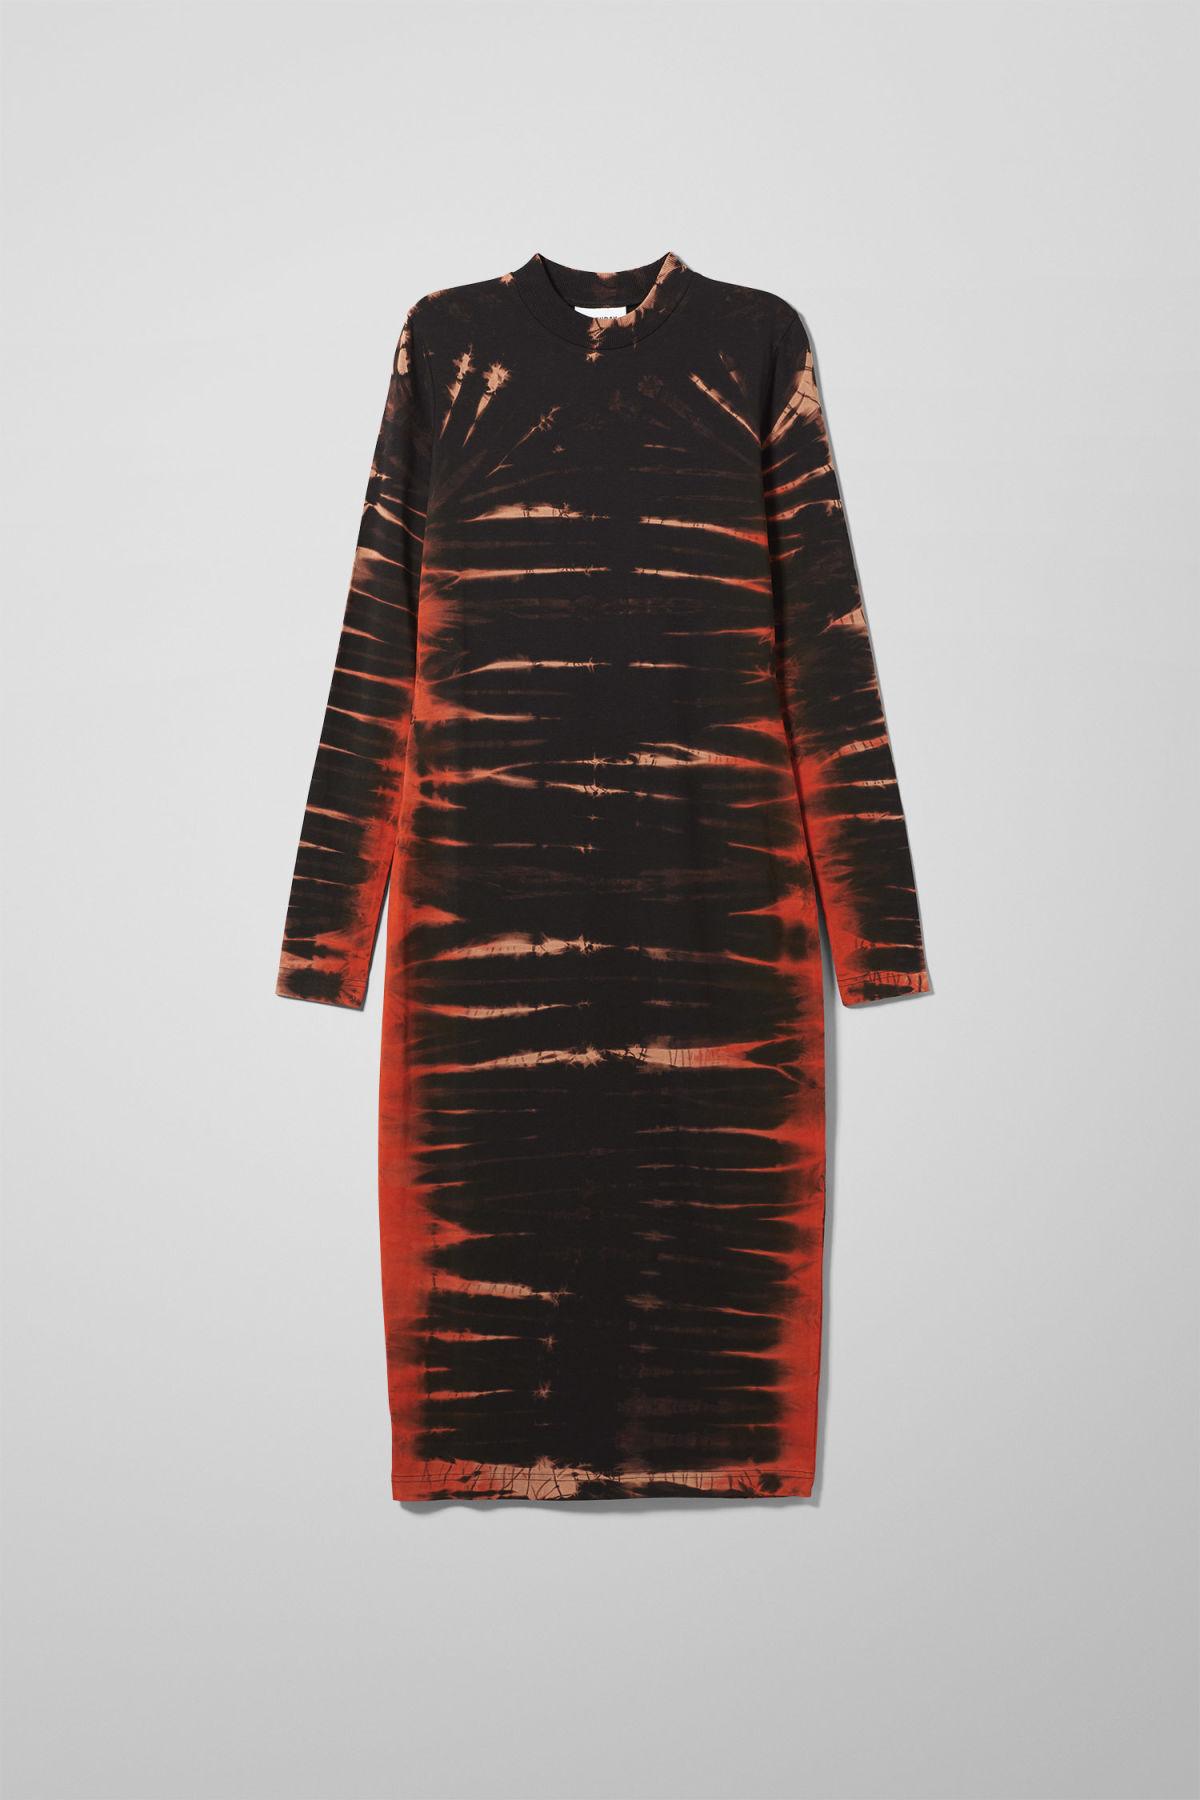 Image of Meja Dress - Beige-M